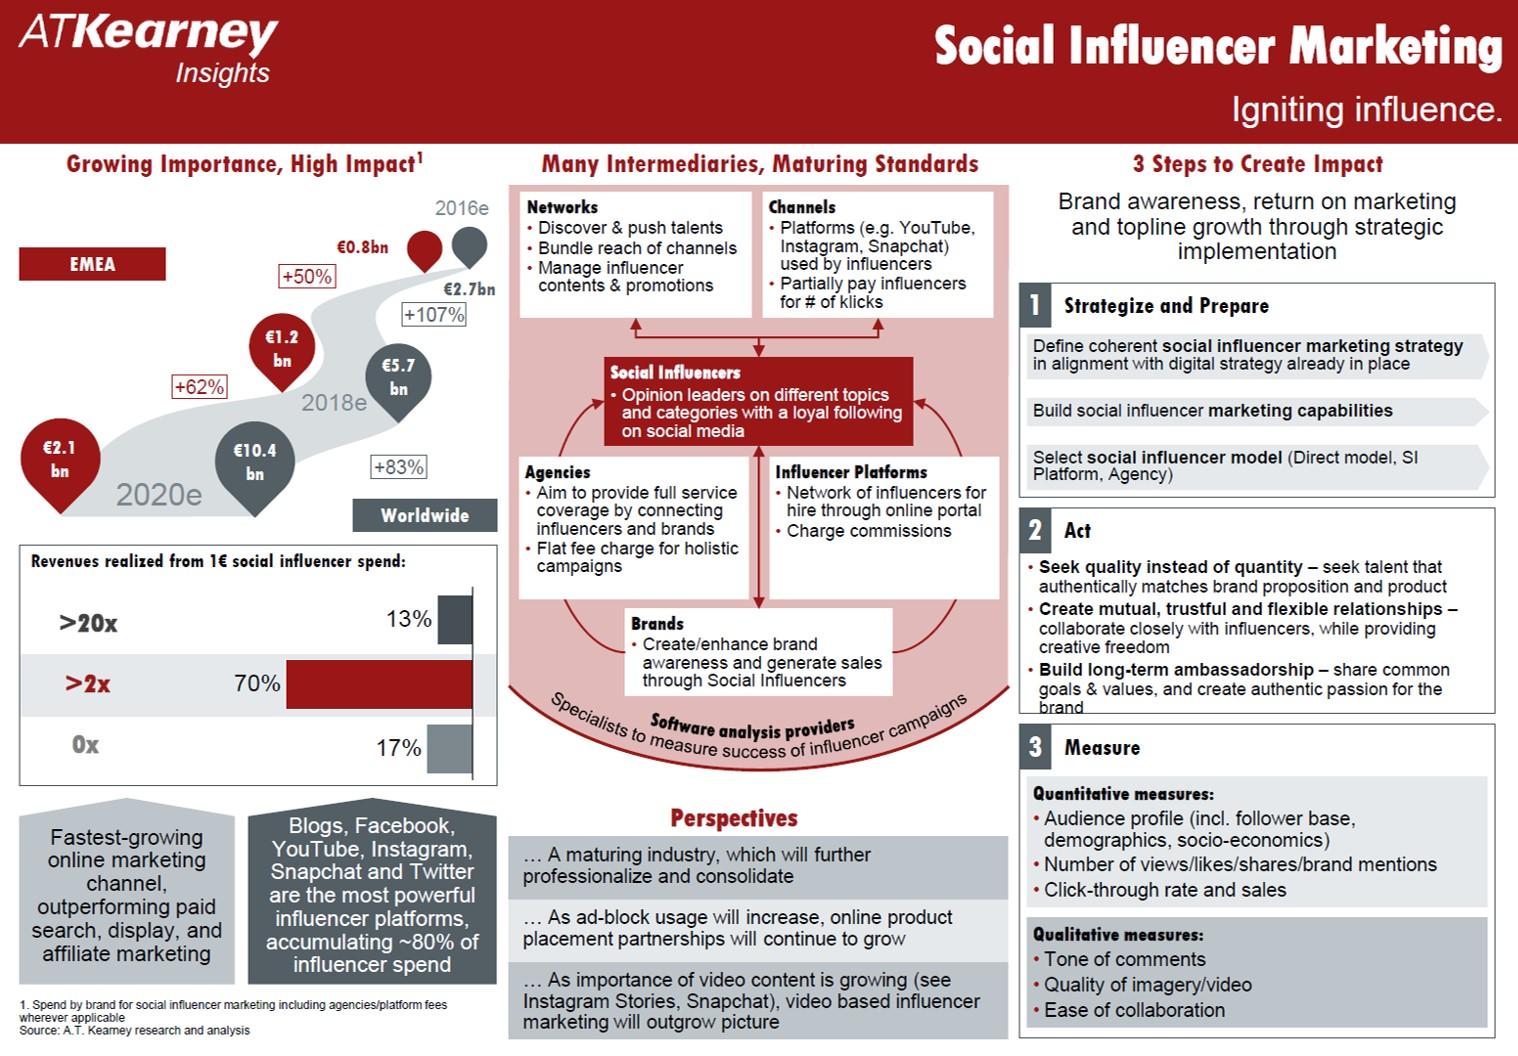 A.T. Kearney Influencer Marketing Study